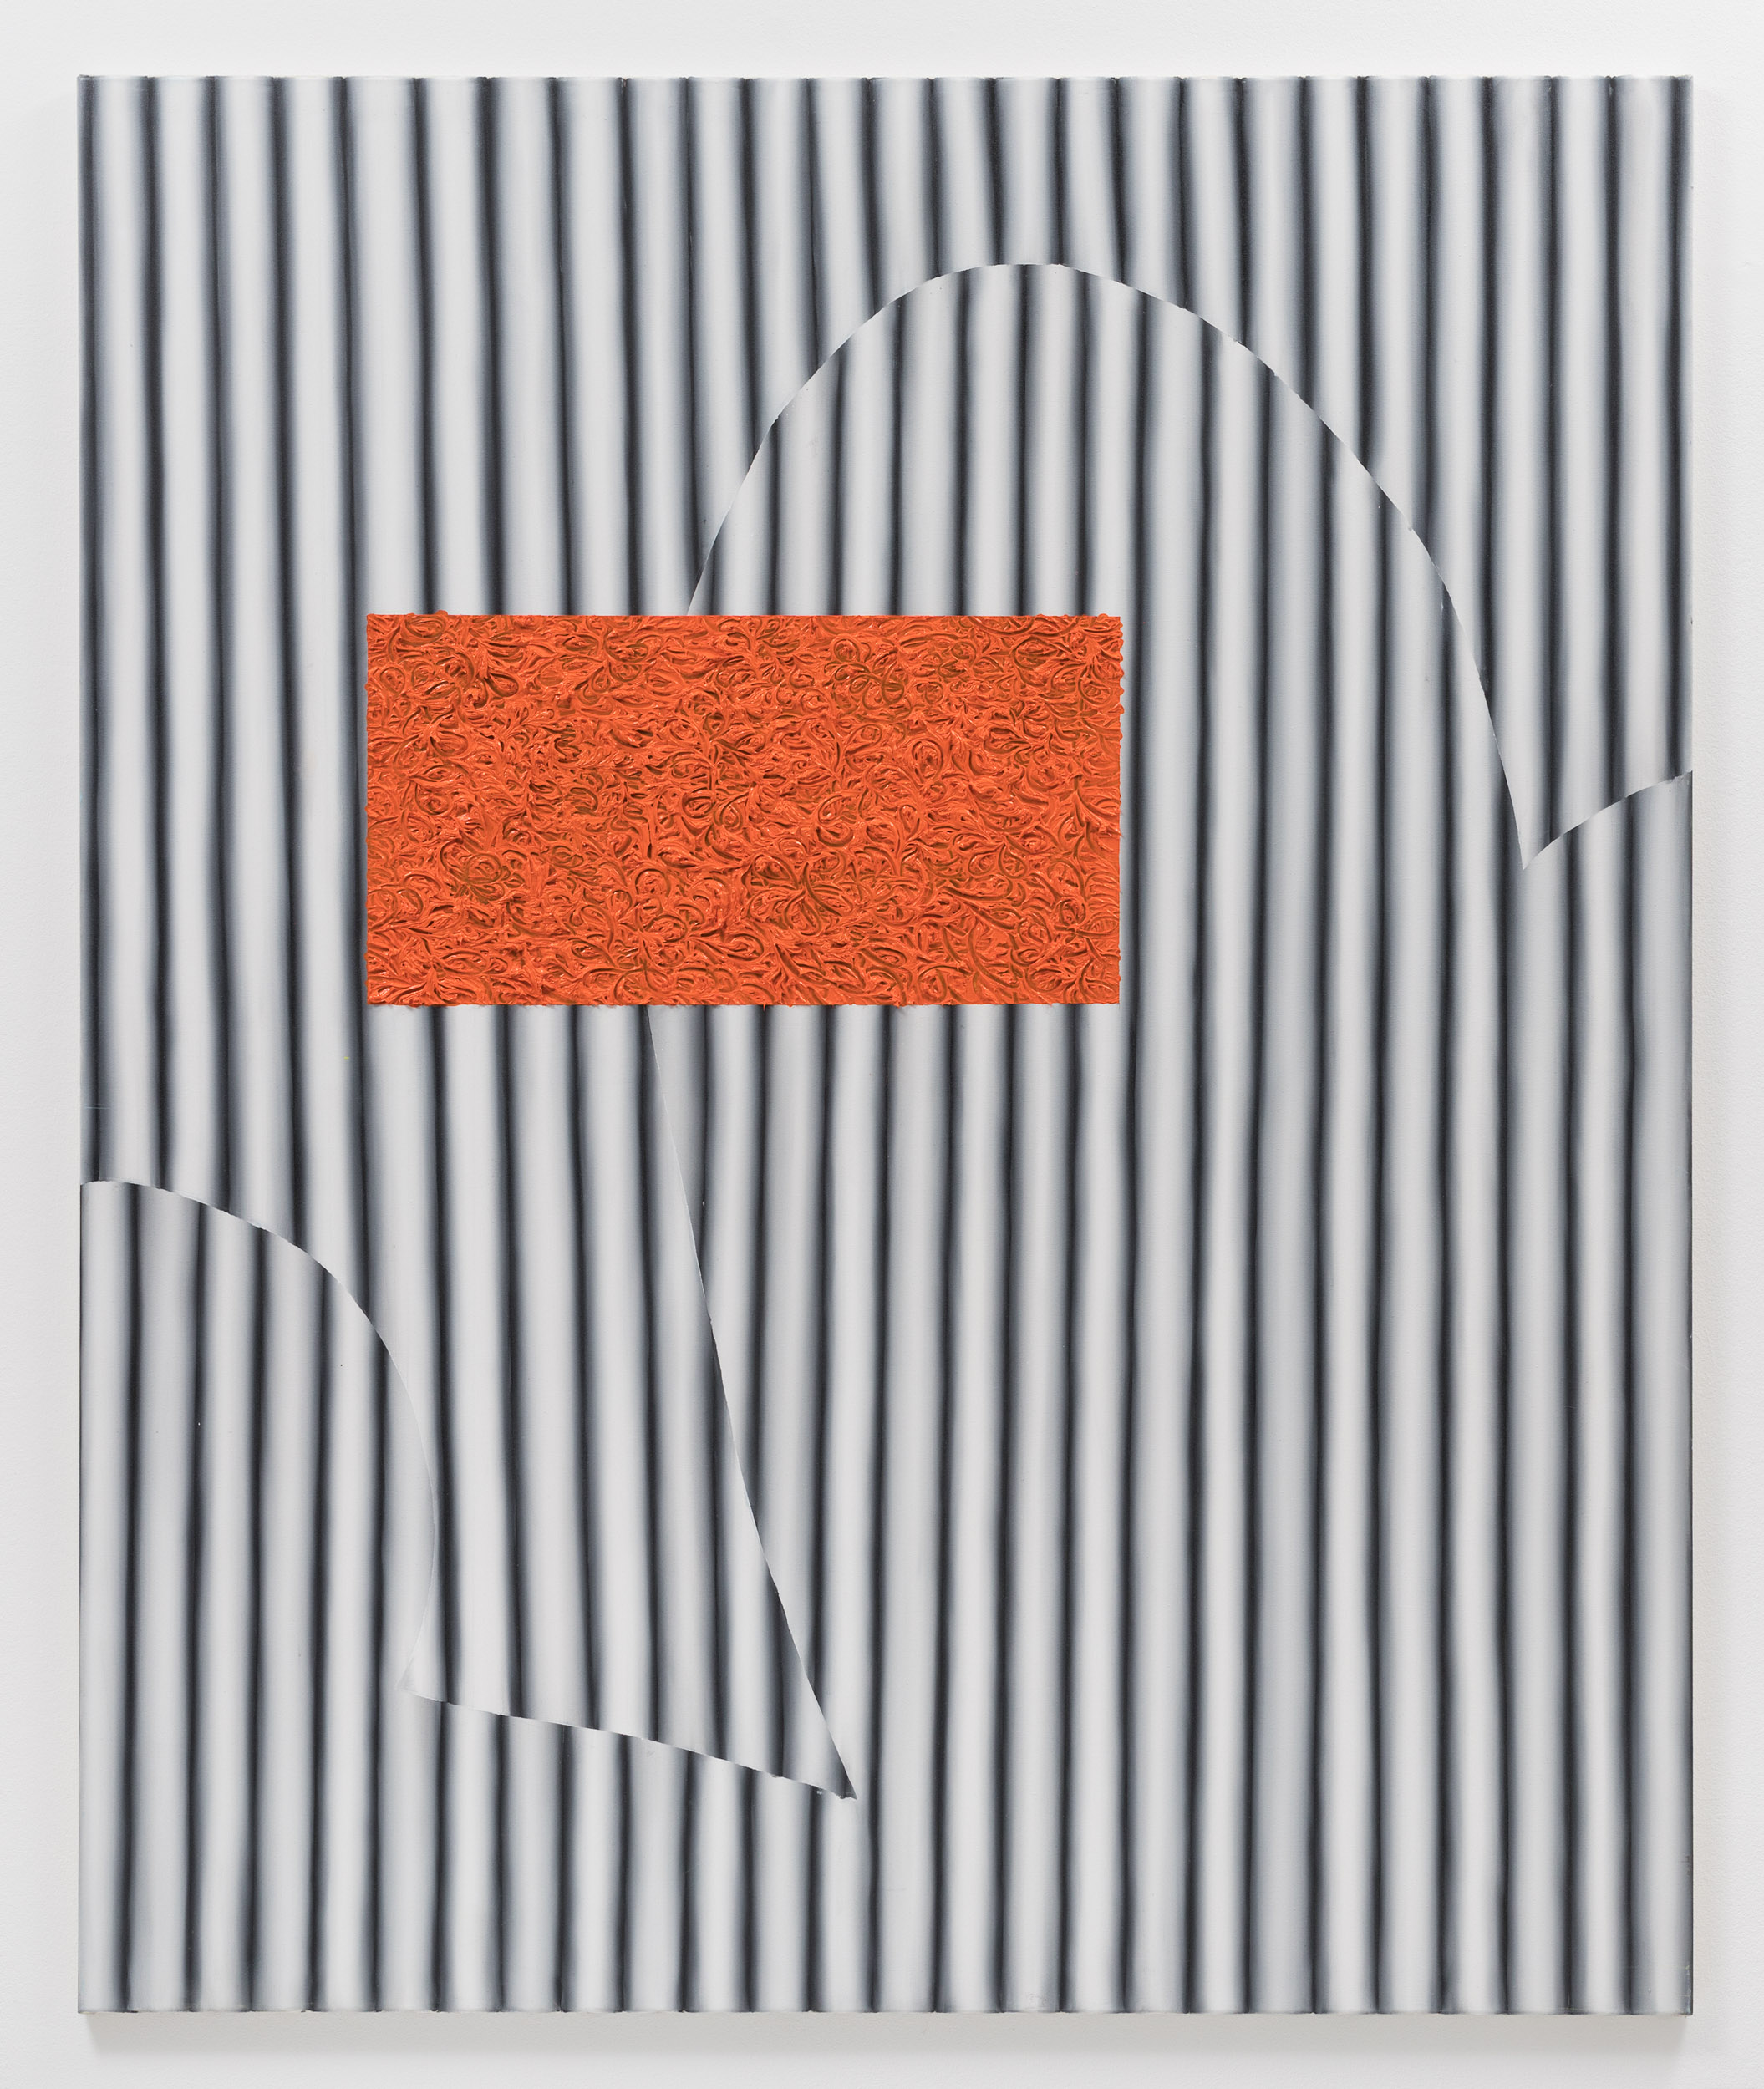 BlackOrange, 2018, 180x150cm, Öl auf Leinwand